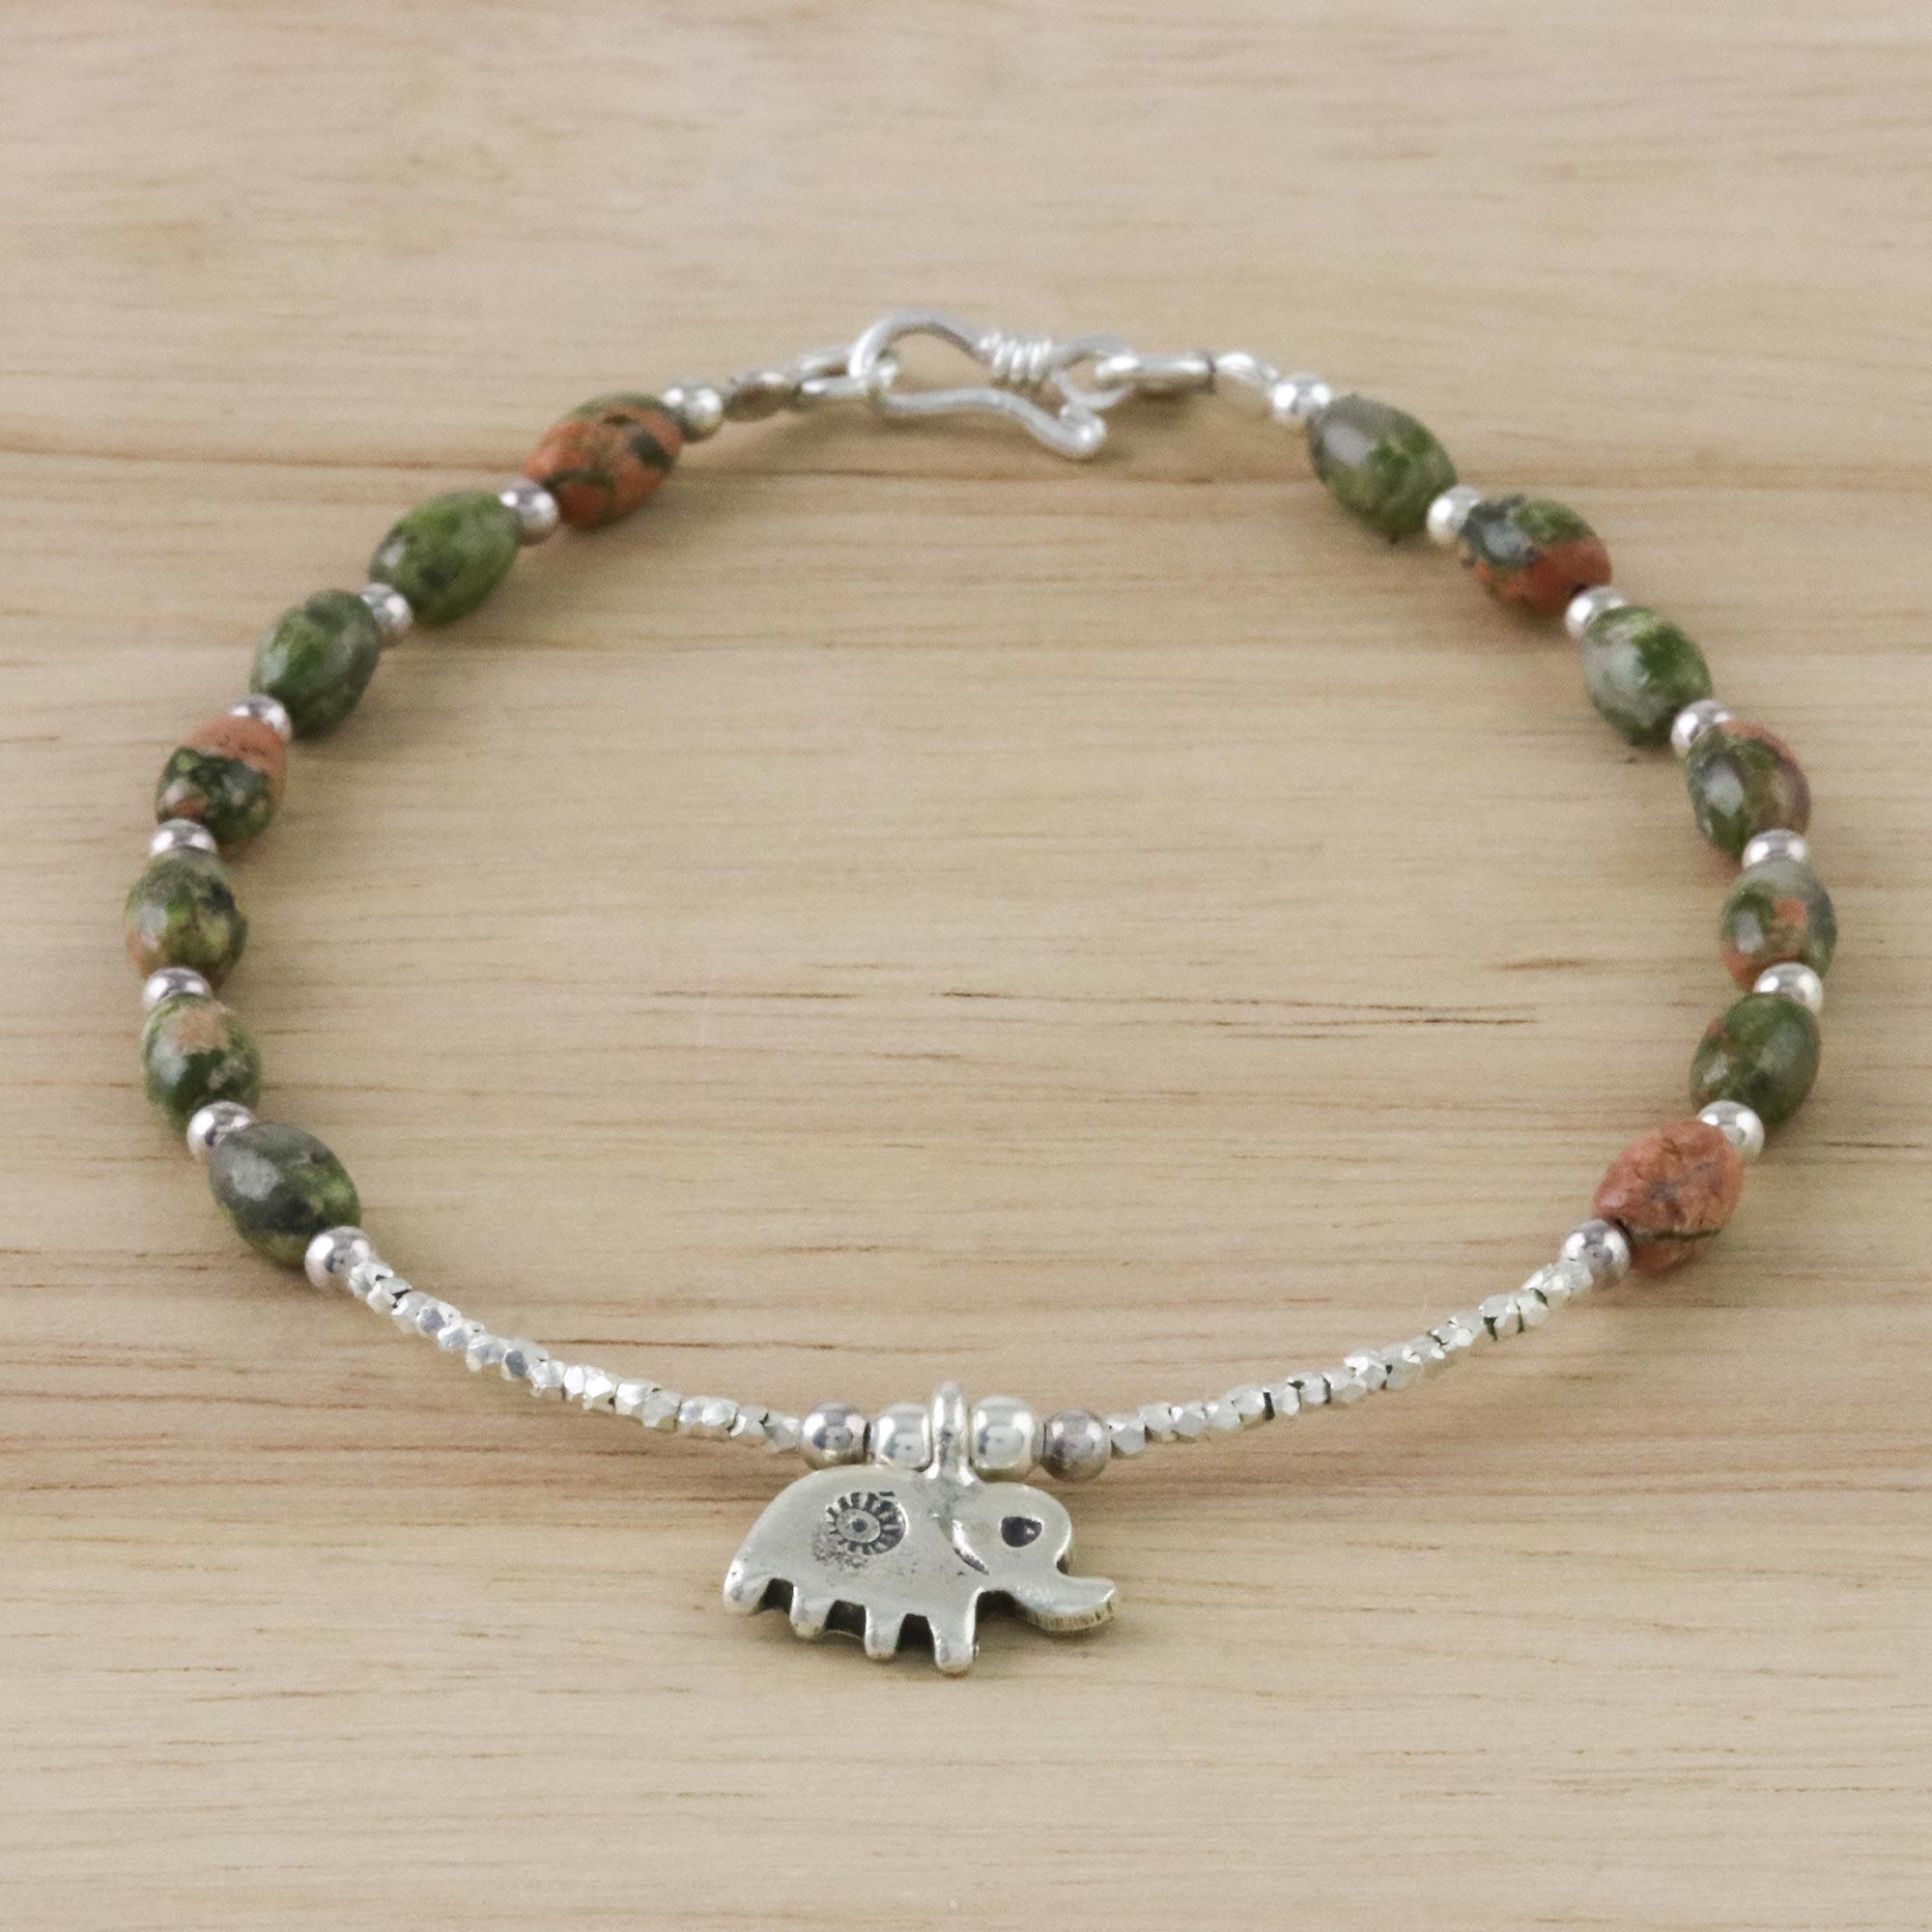 32b5cb3b2d4ea Sterling Silver and Unakite Beaded Elephant Charm Bracelet, 'Elephant  Forest'